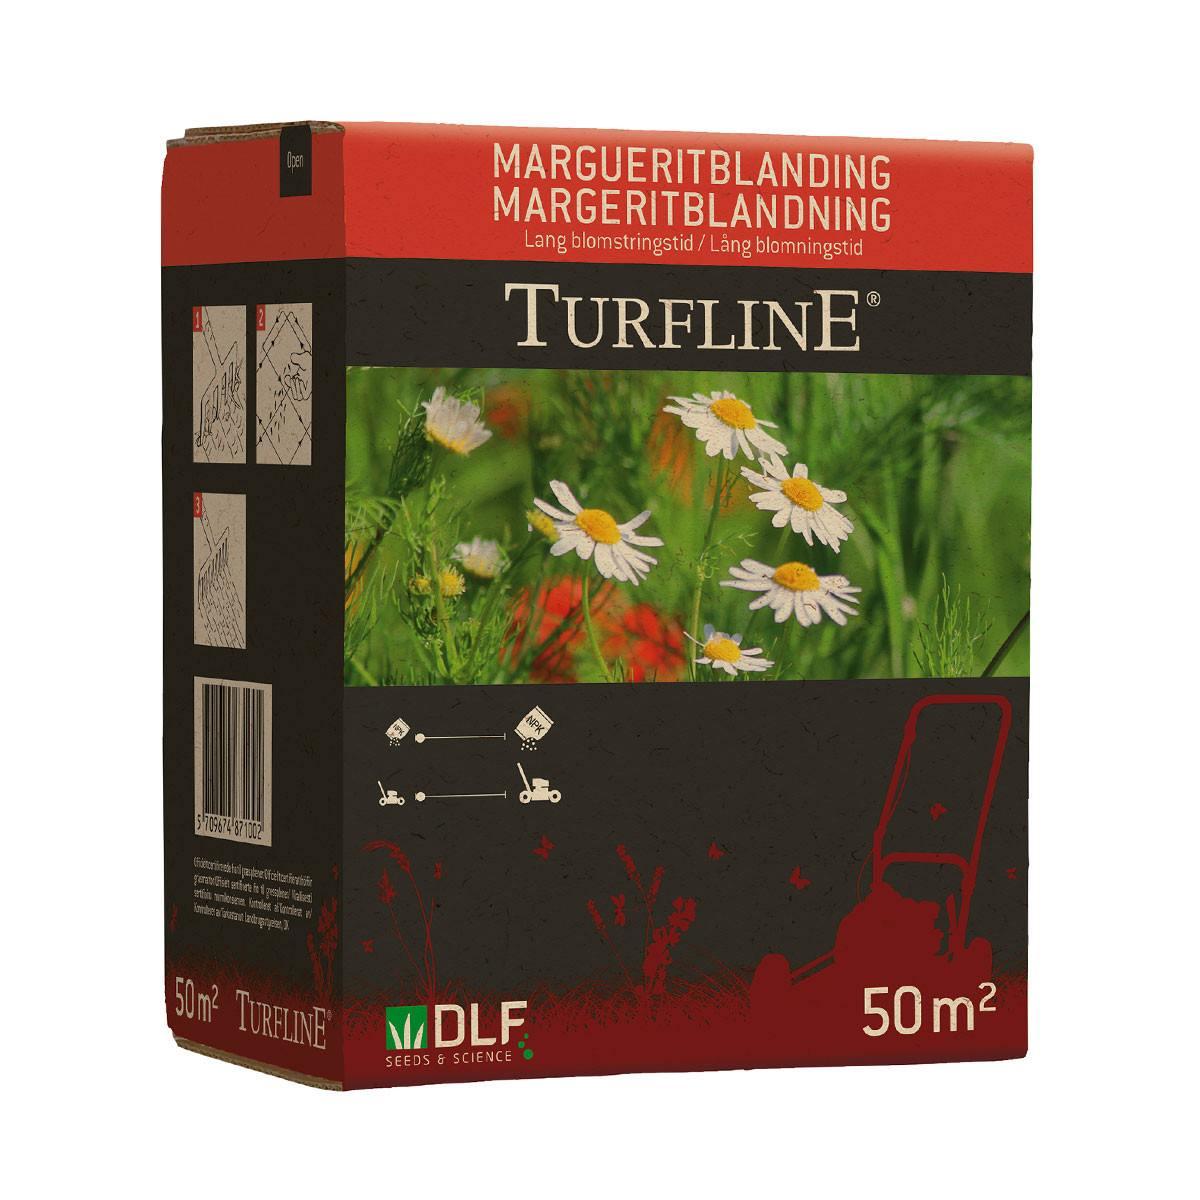 Turfline Margueritblanding - 50m2